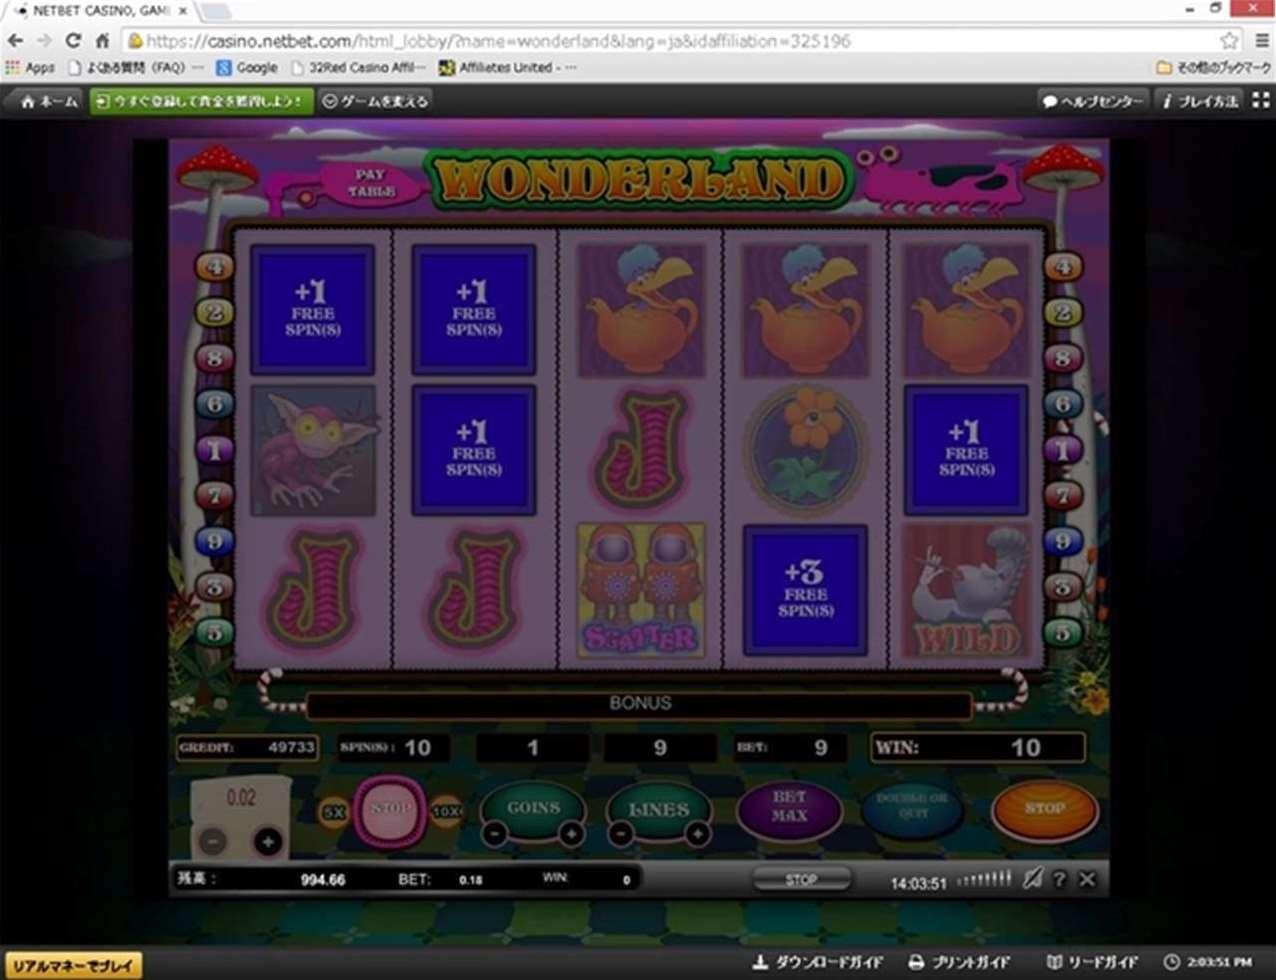 Wonderlandボーナスゲーム5